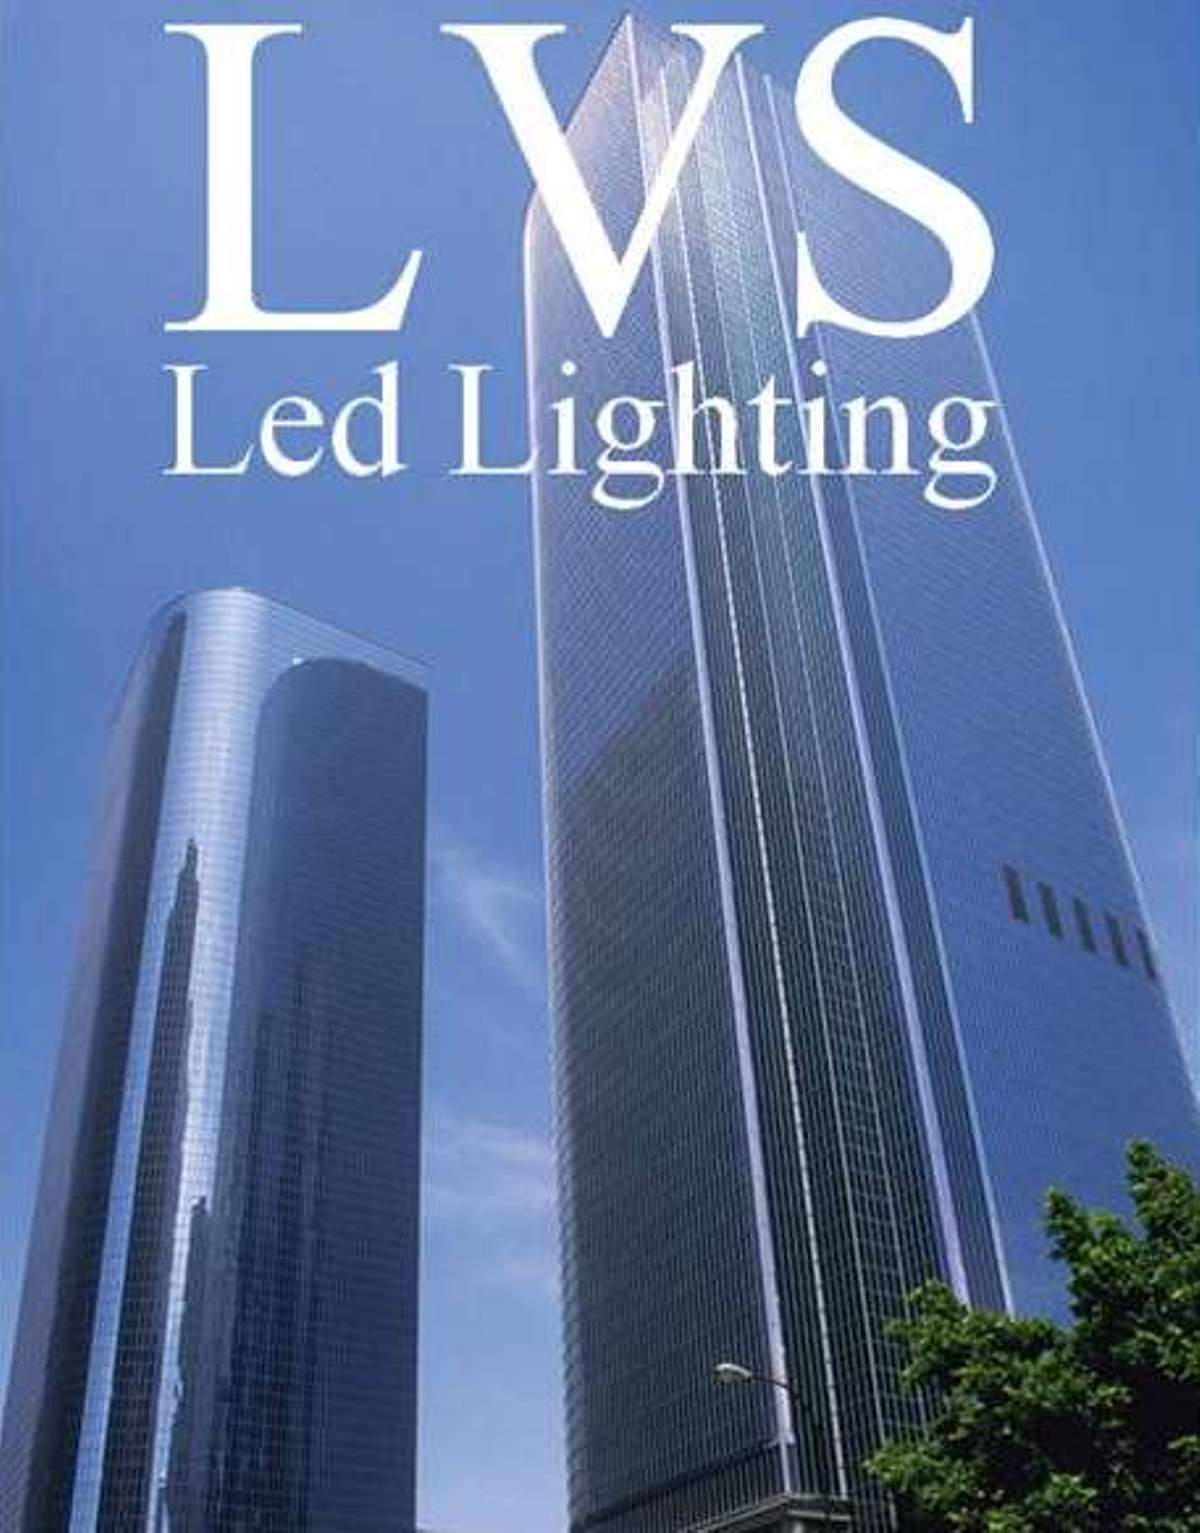 https://www.ledverlichtingshop.nl/UserFiles/LVS%20grote%20sticker%201200x1533(2).jpg